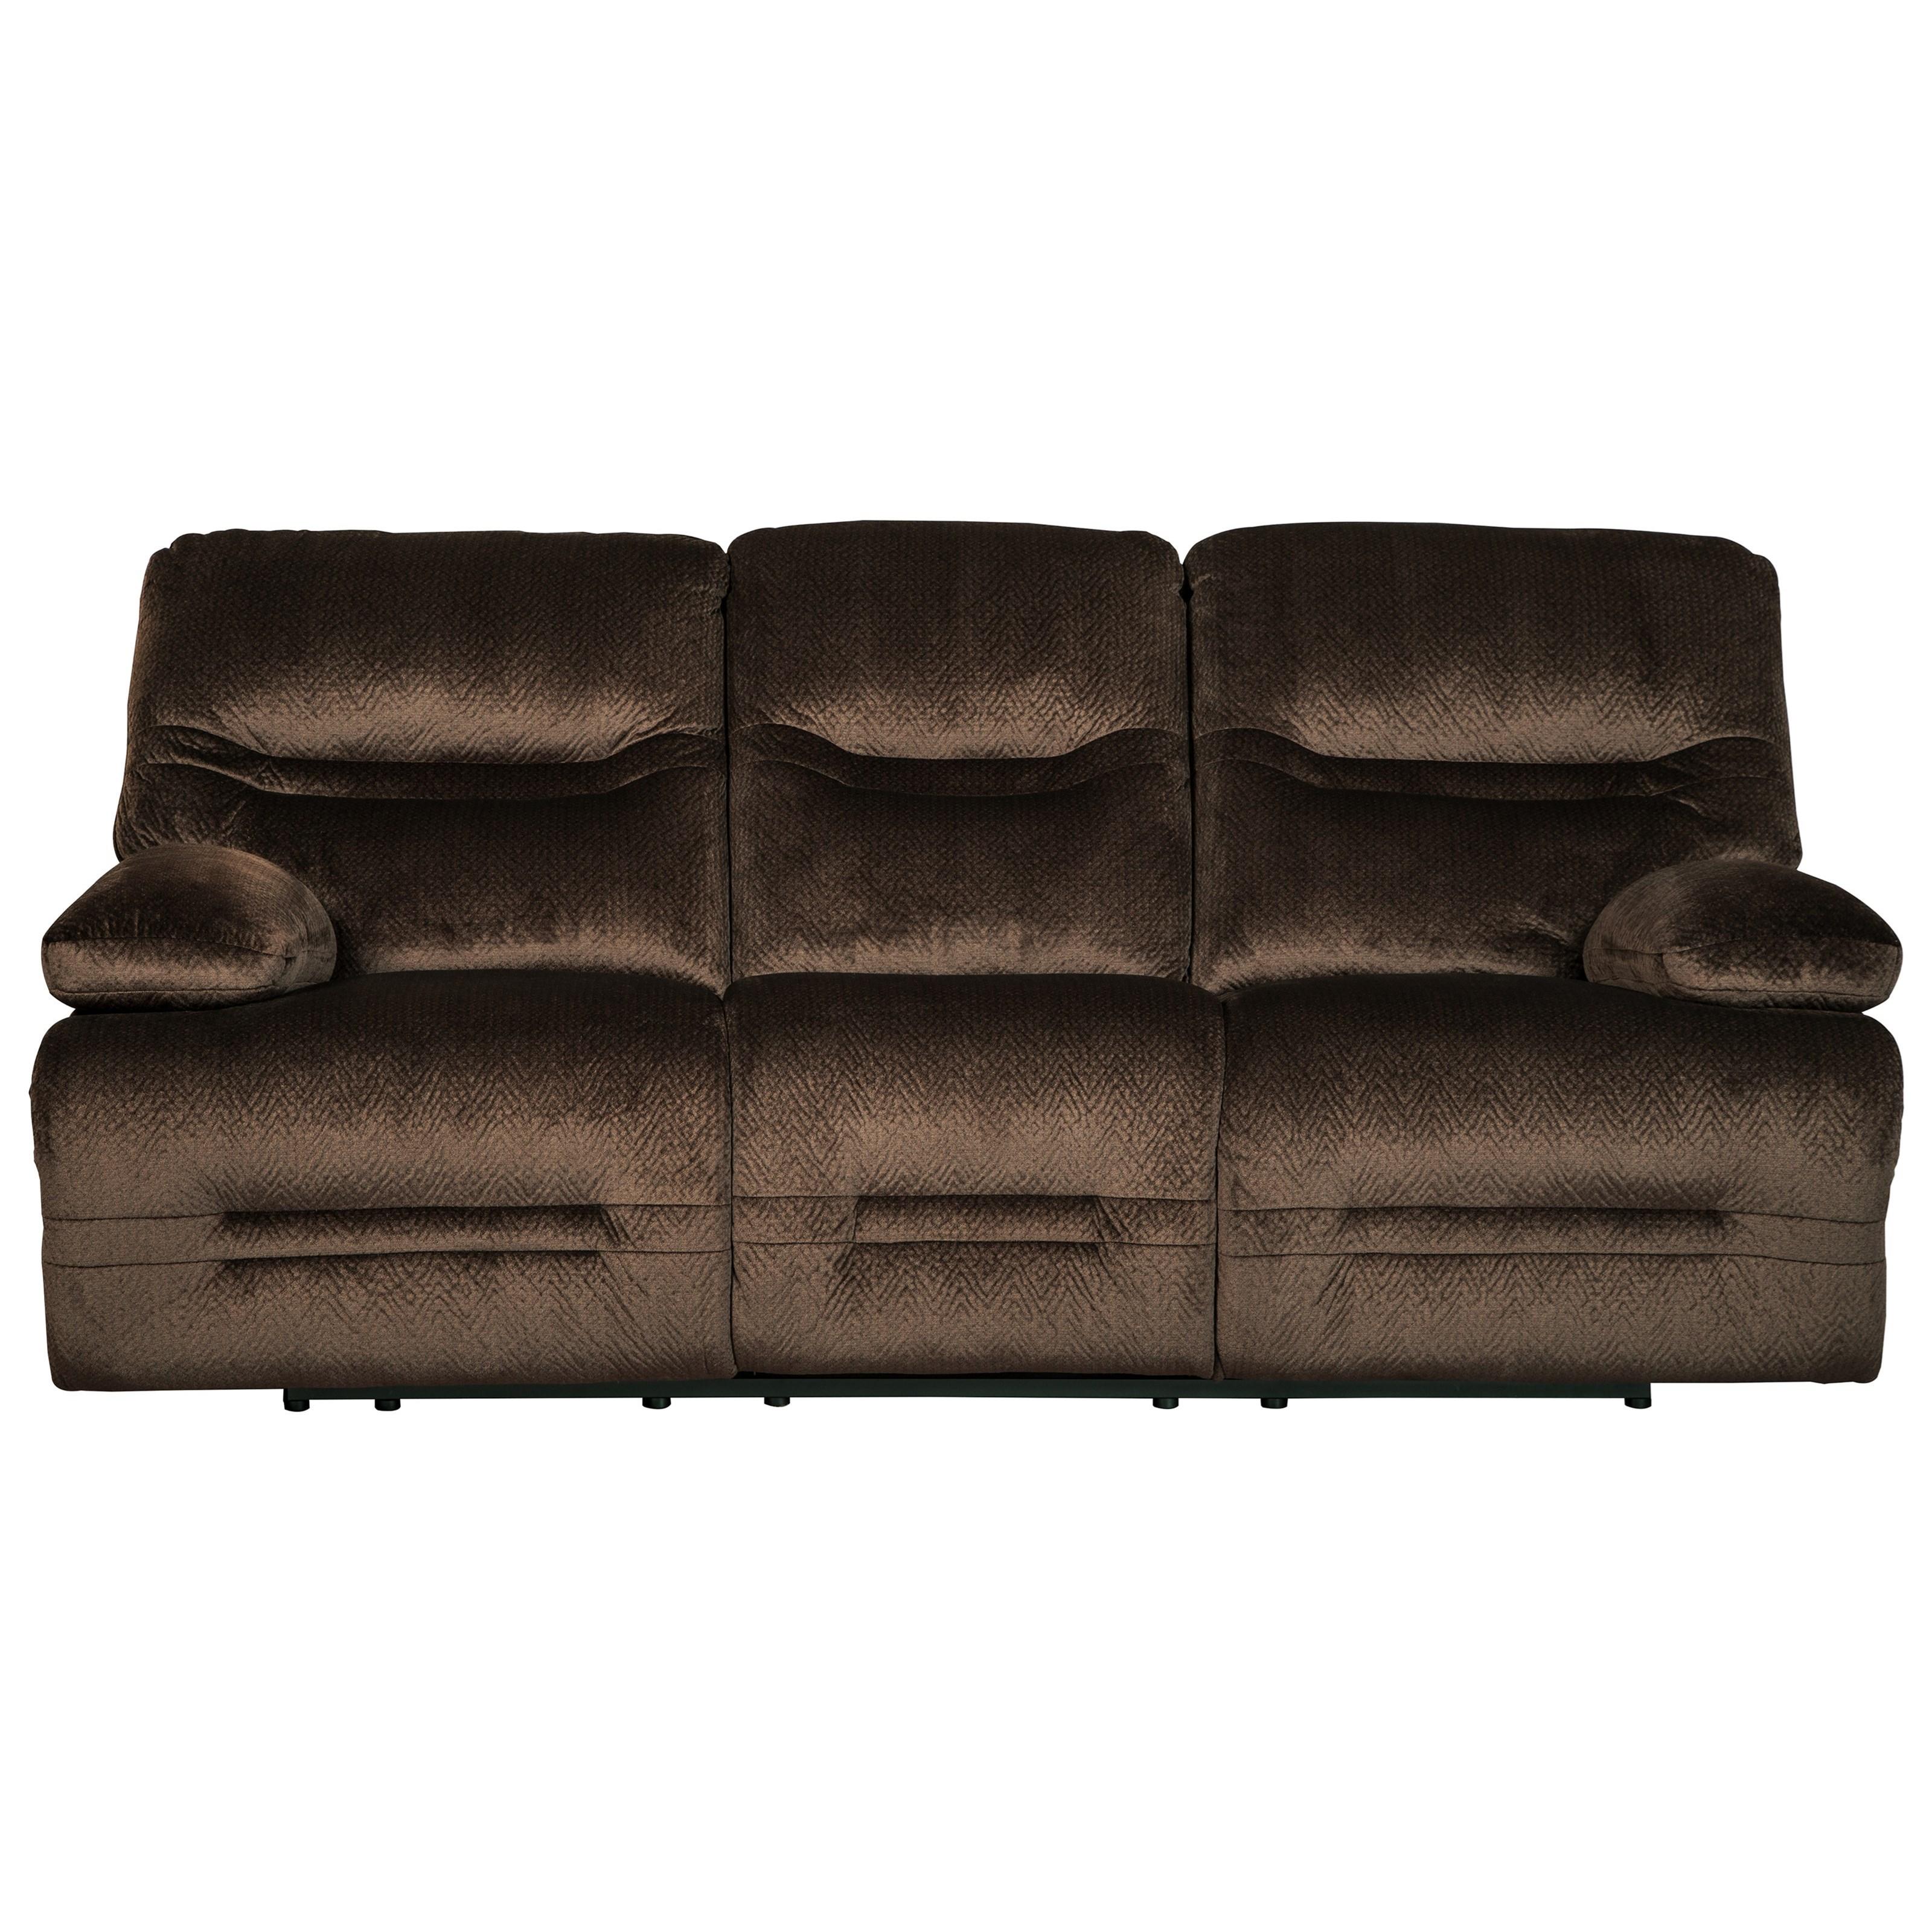 Signature design by ashley brayburn contemporary reclining for Contemporary reclining sofas